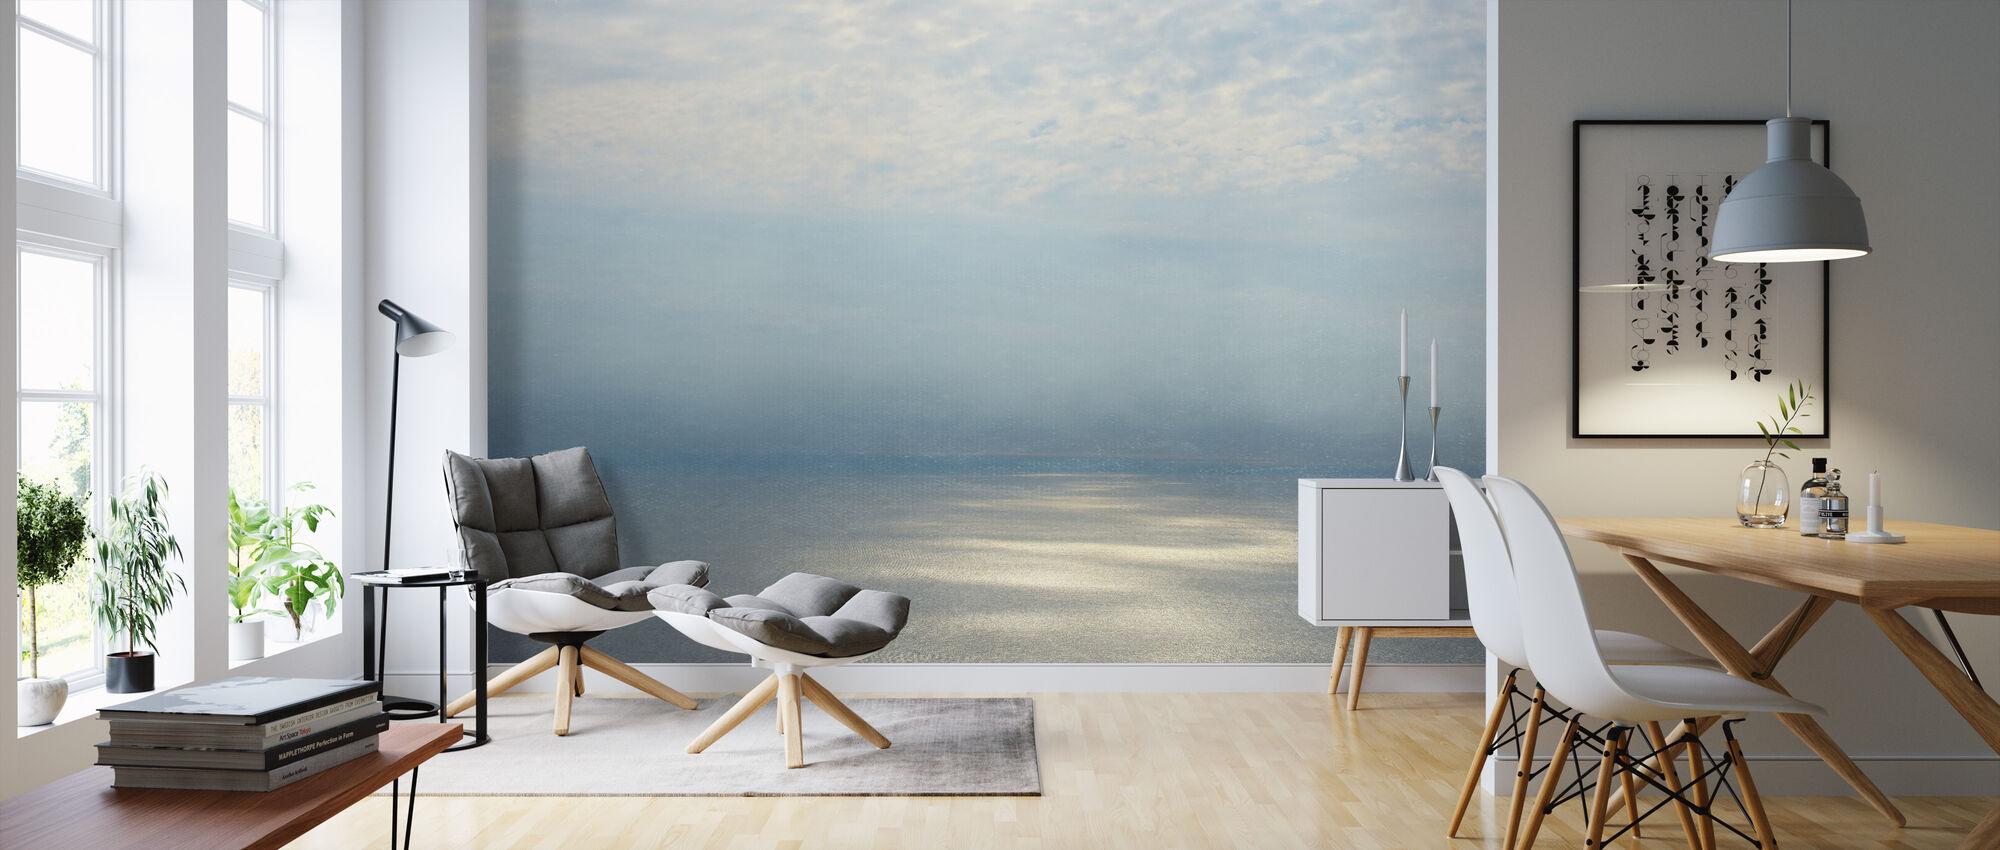 Smoke Horizon Filter - Wallpaper - Living Room